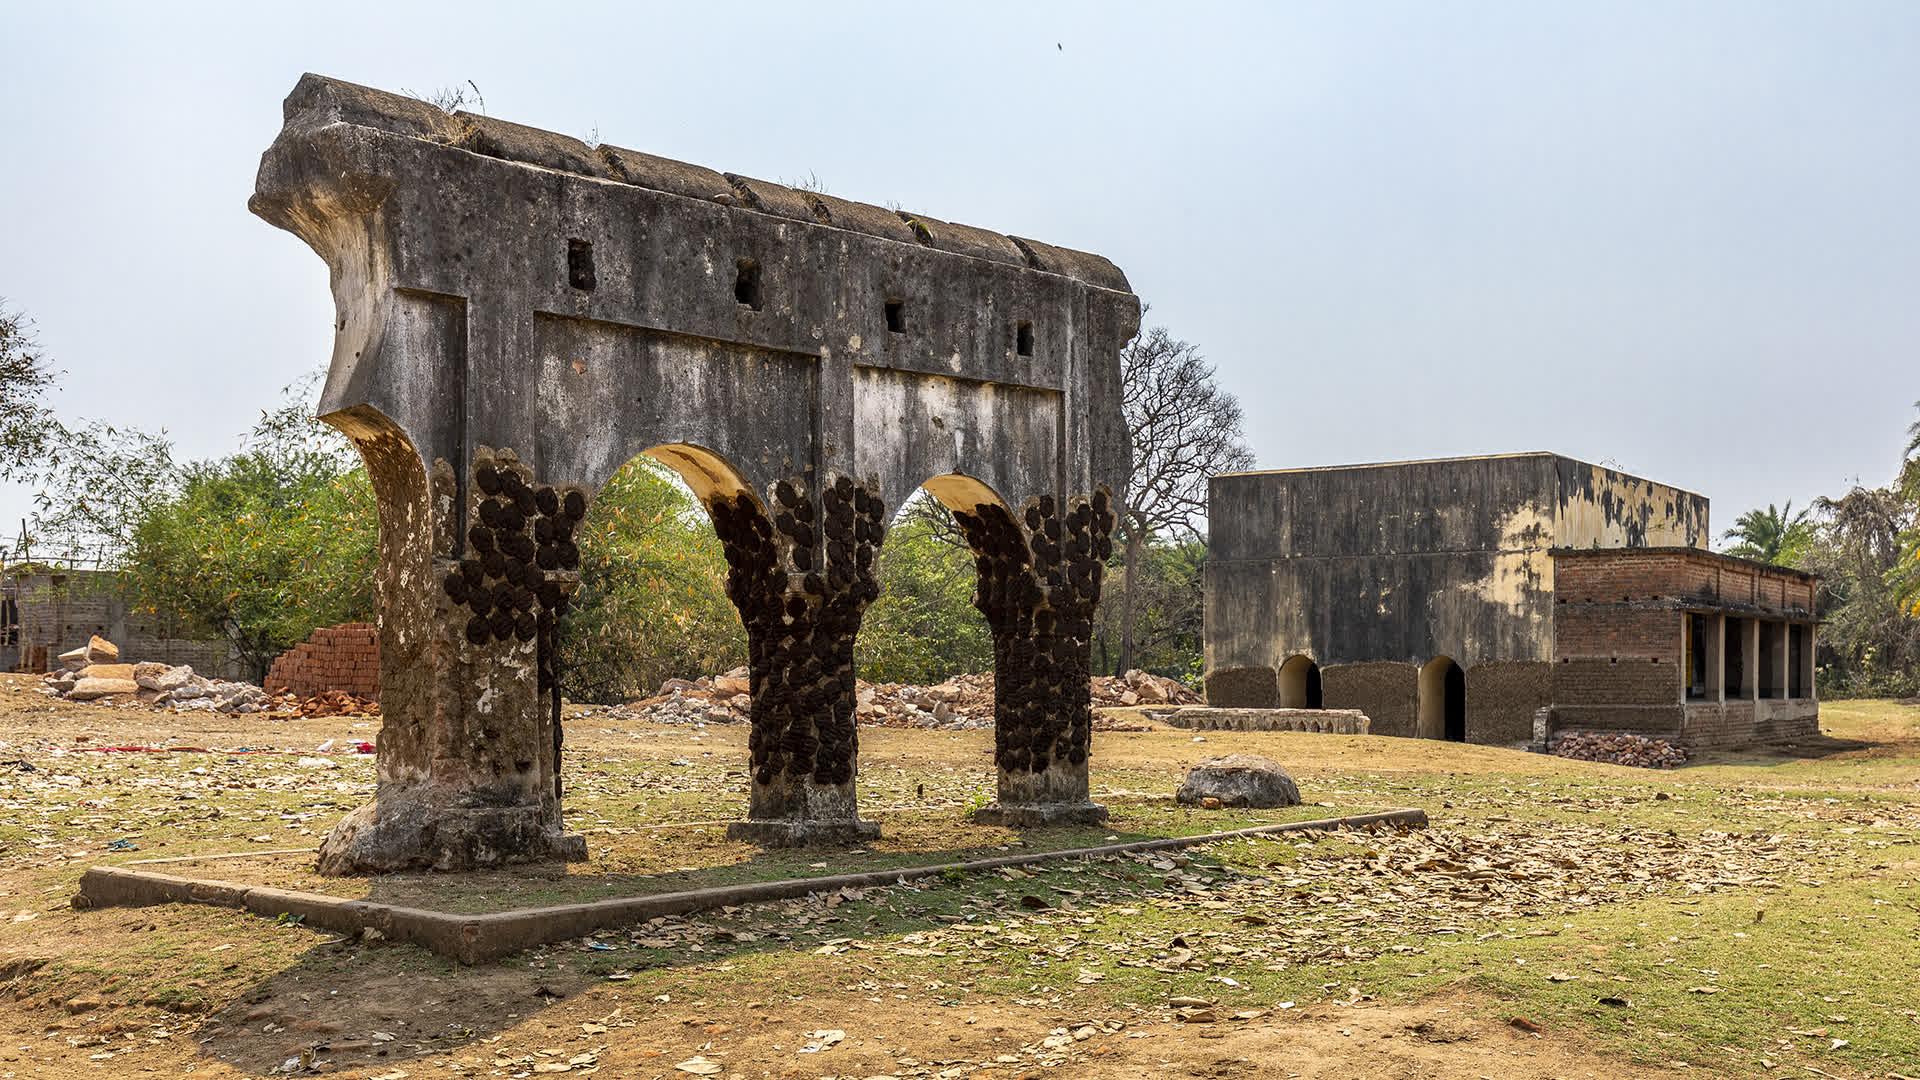 A Ruined Arch and the Rajnagar Gunpowder Magazine in the distance